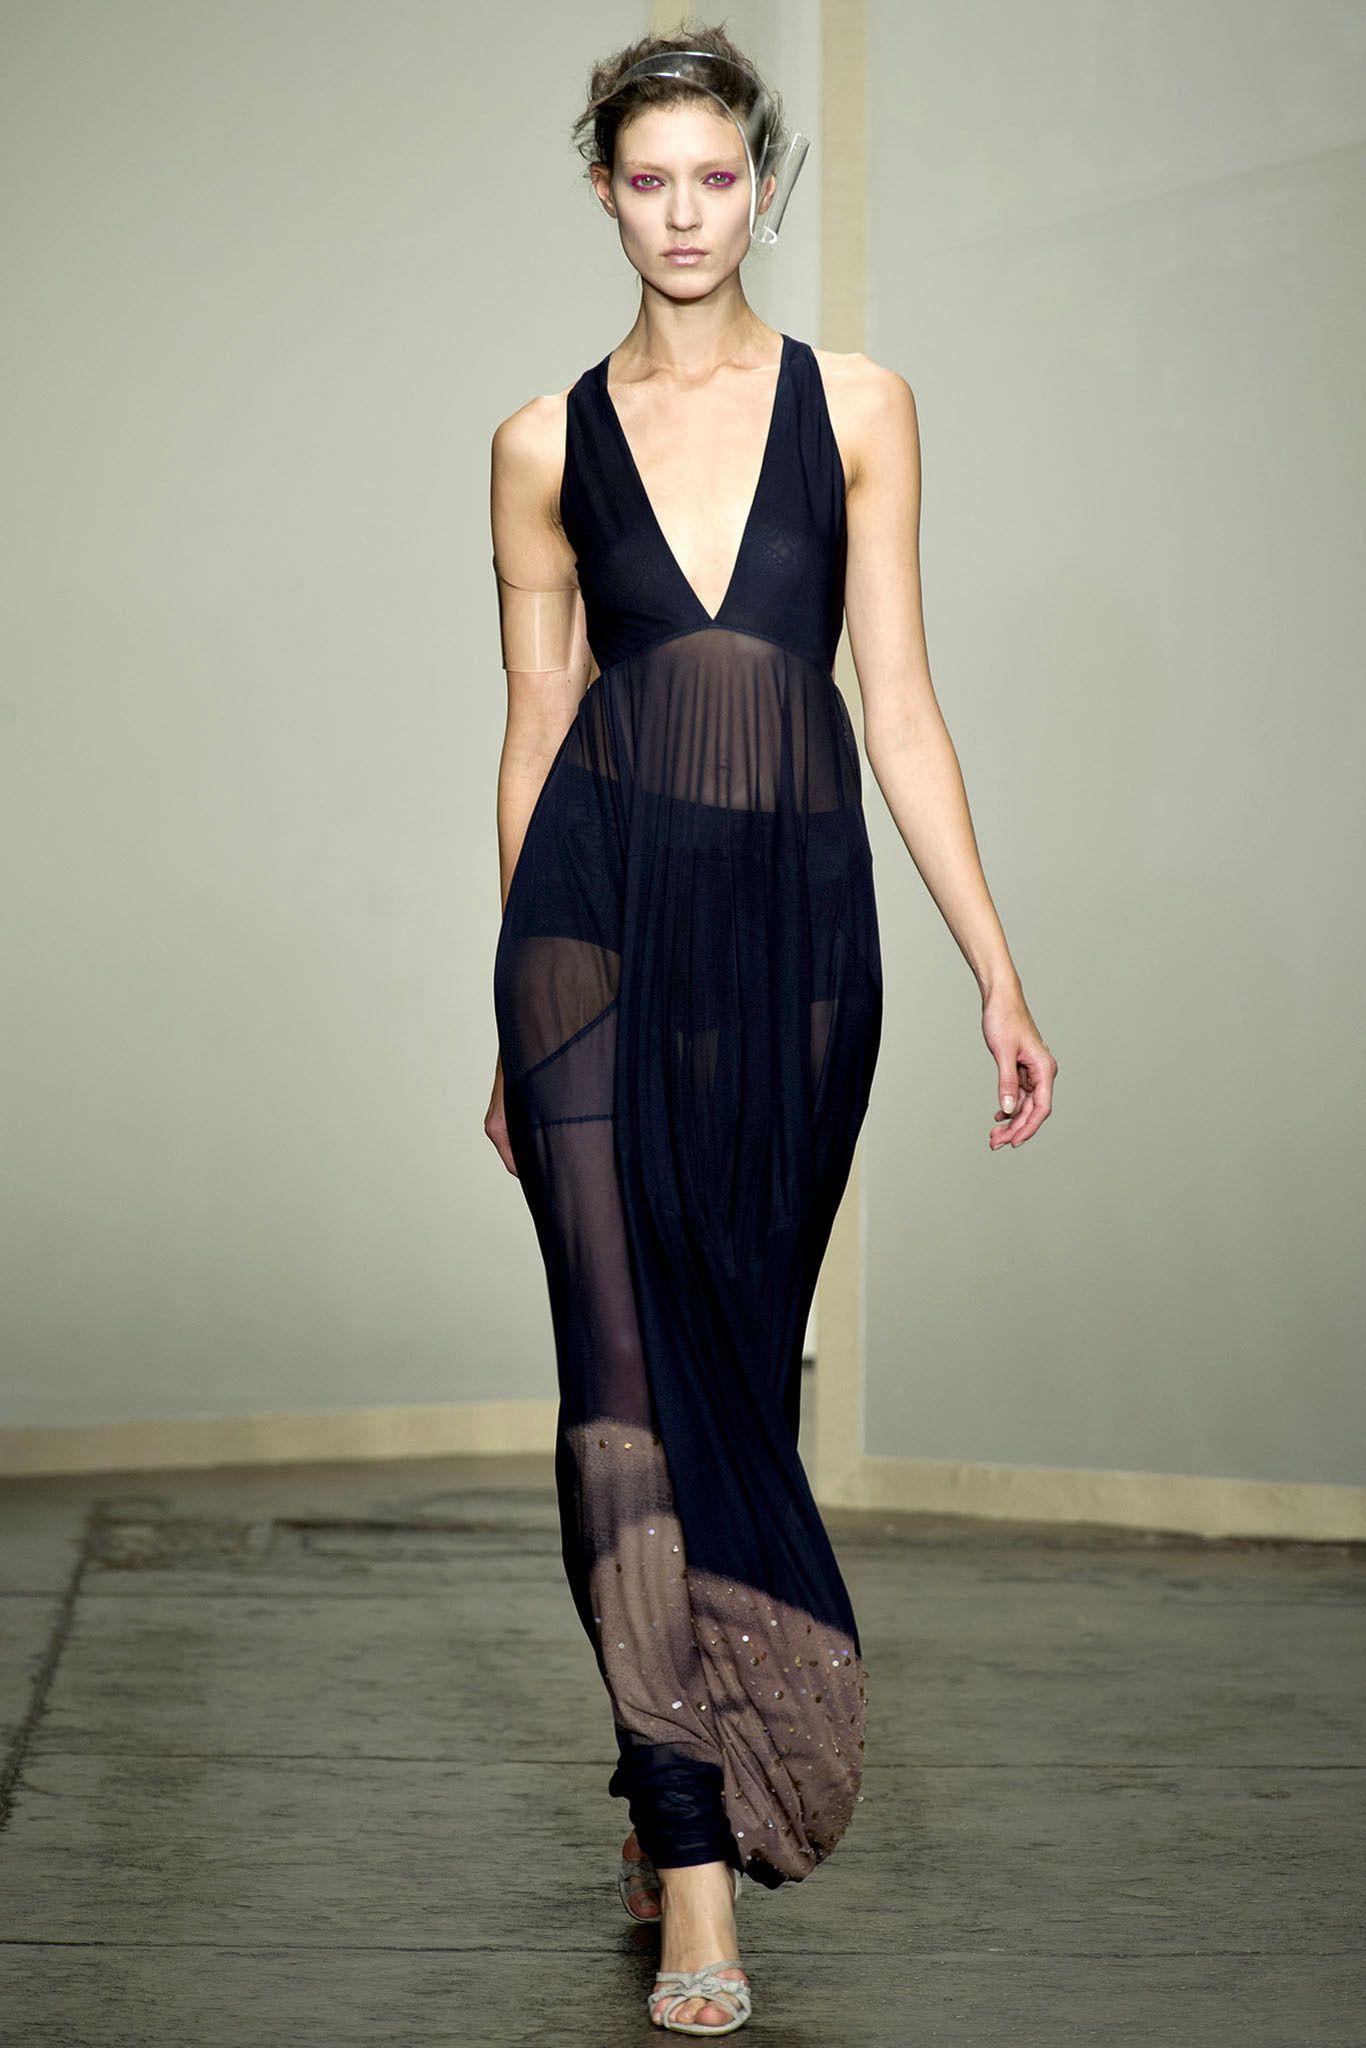 Donna Karan Spring 2013 Ready-to-Wear Fashion Show - Vanessa Axente